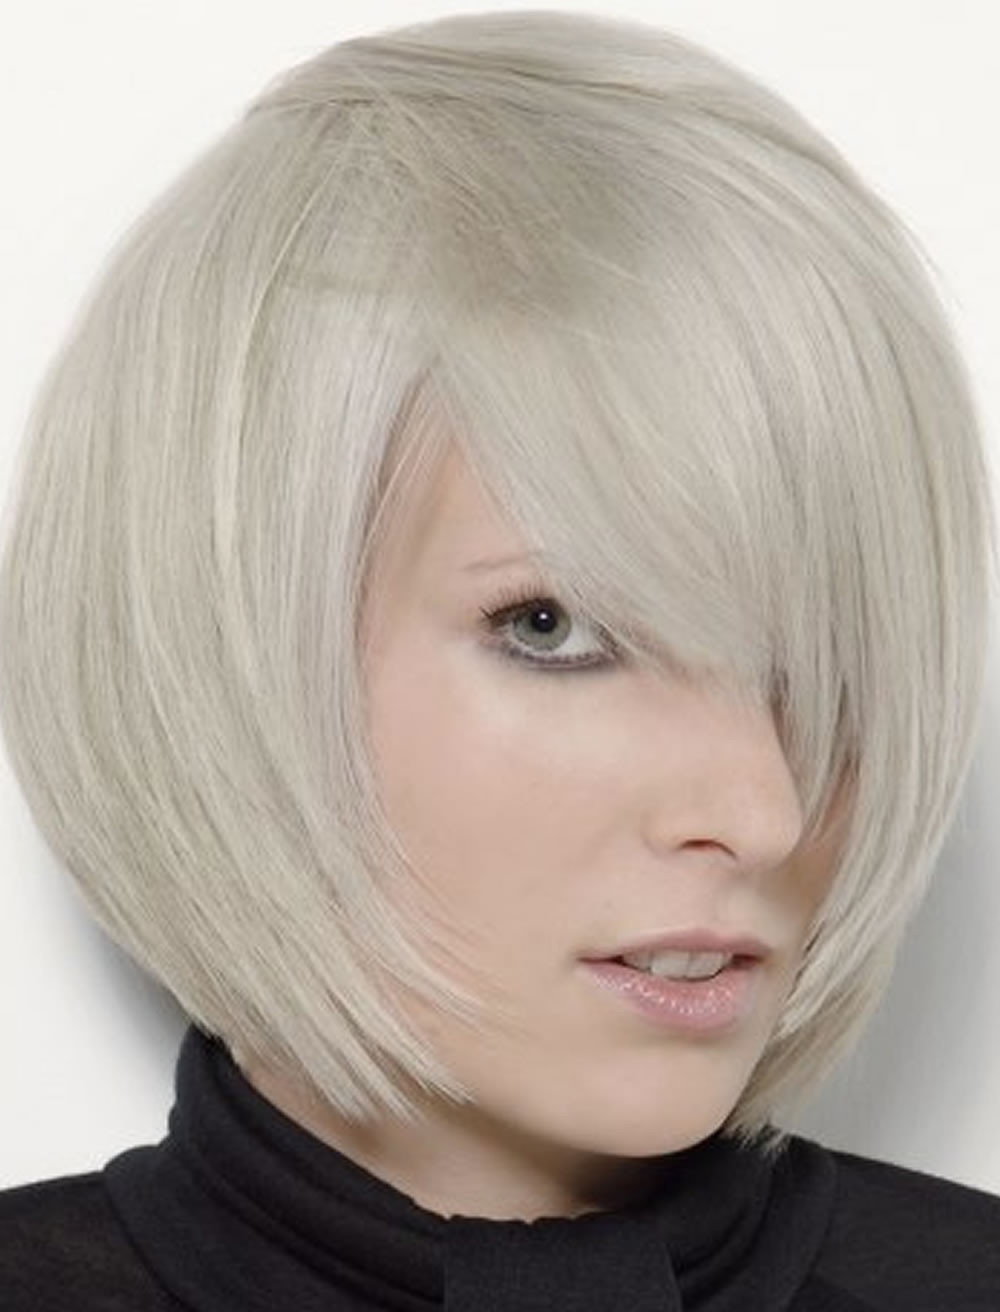 Bob Hairstyles Images  2018 Bob Hairstyles and Haircuts – 25 Hottest Bob Cut